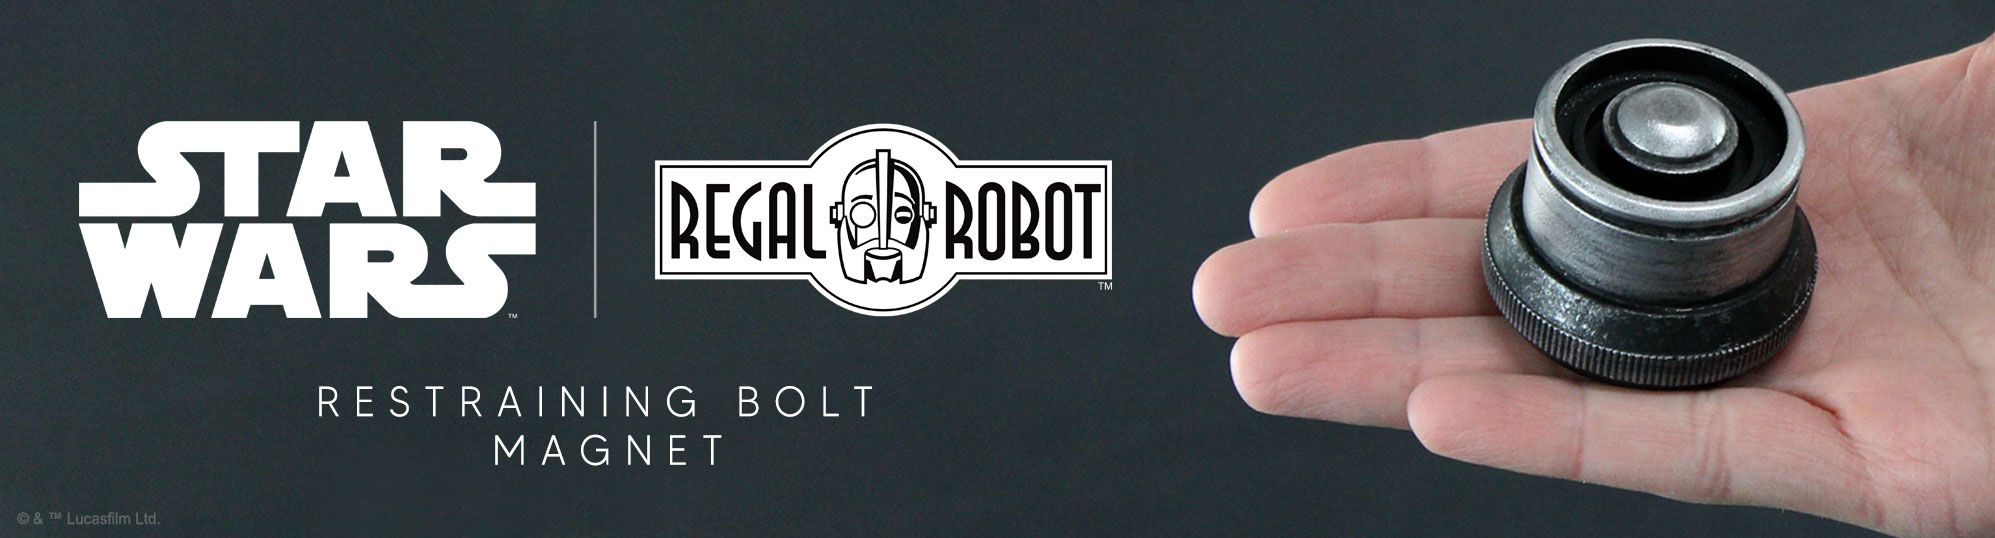 Star Wars resin magnet droid restraining bolt like Galaxy's Edge